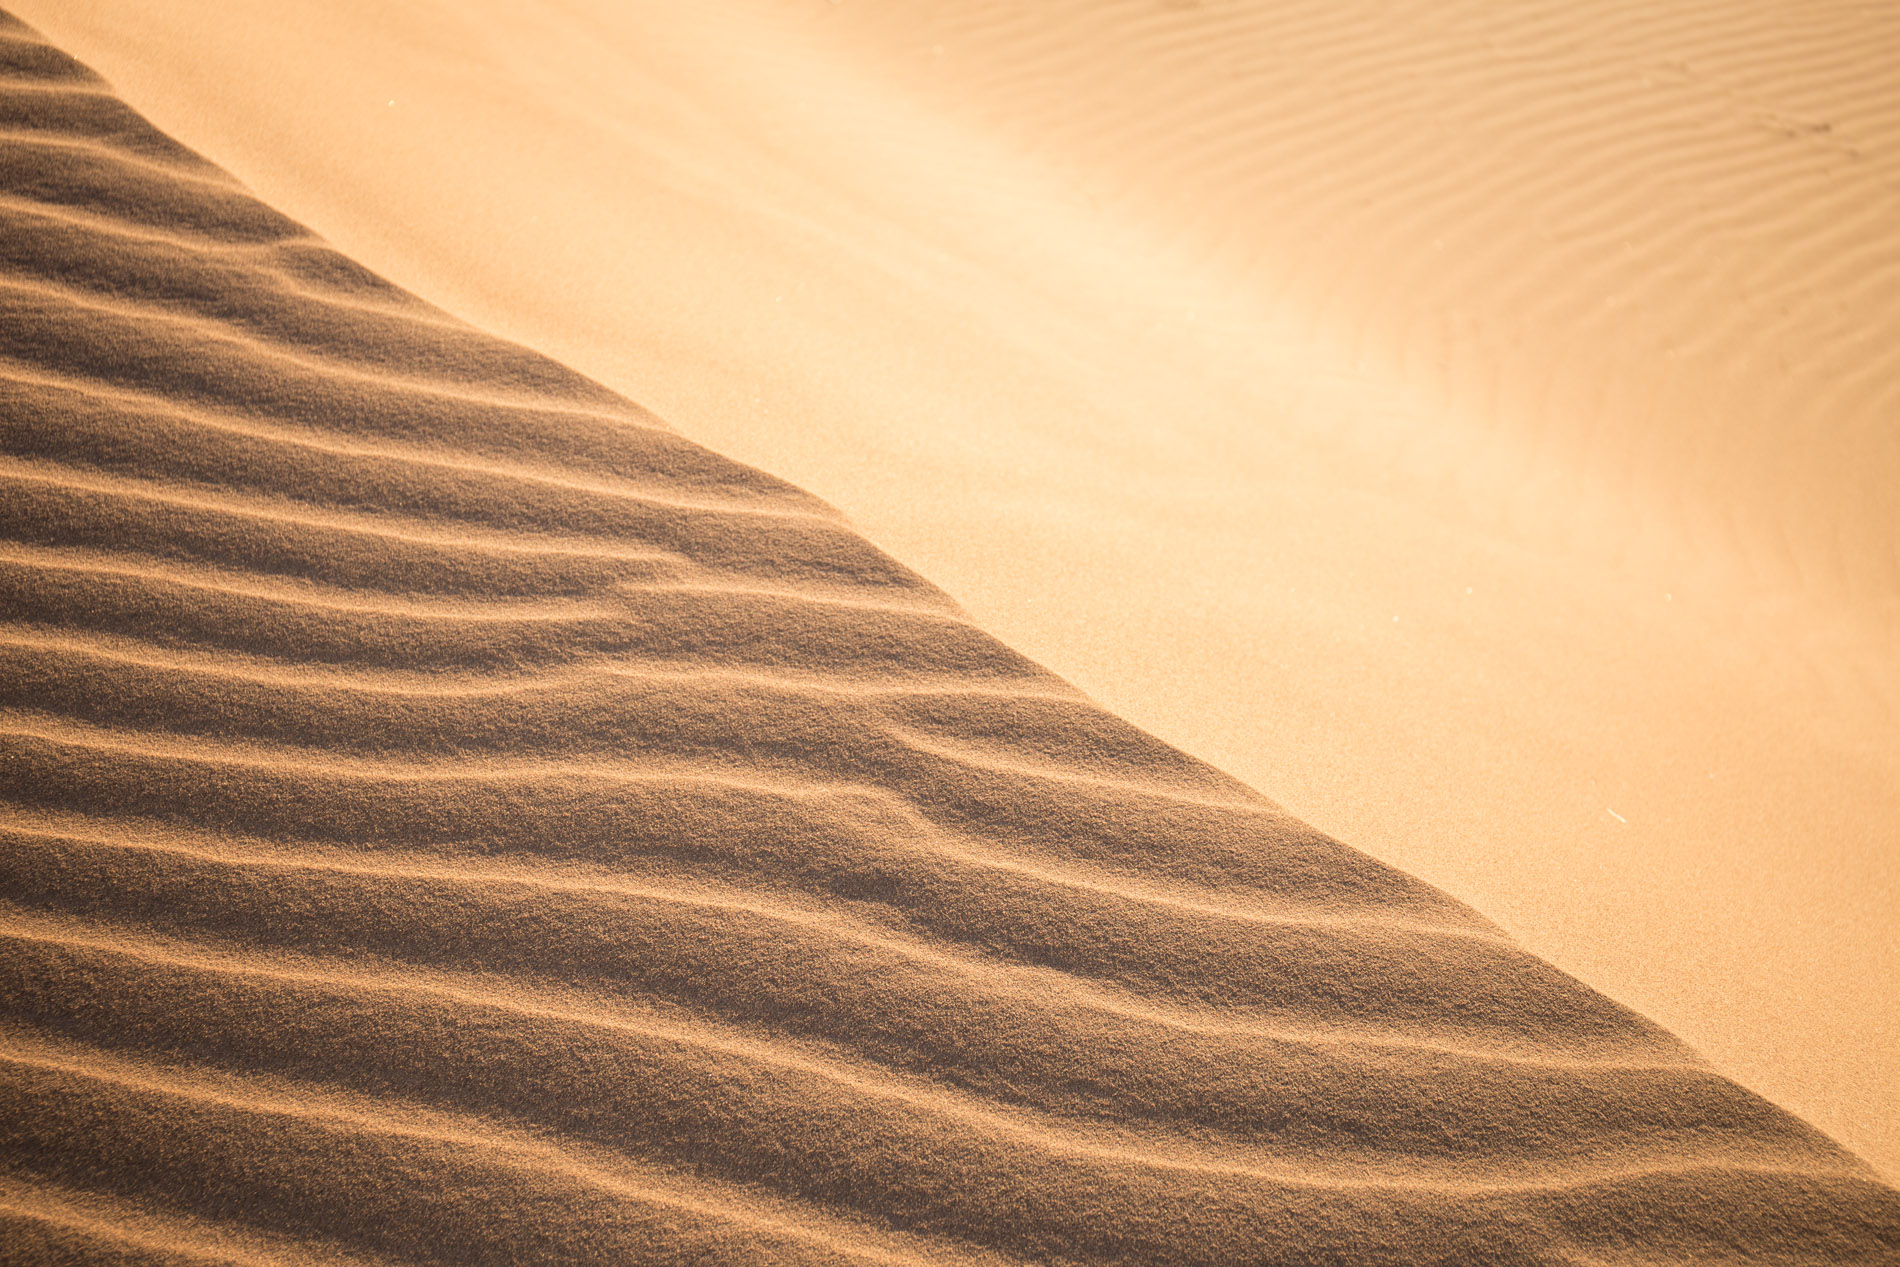 Morocco - Wüste, Berge & Mehr.